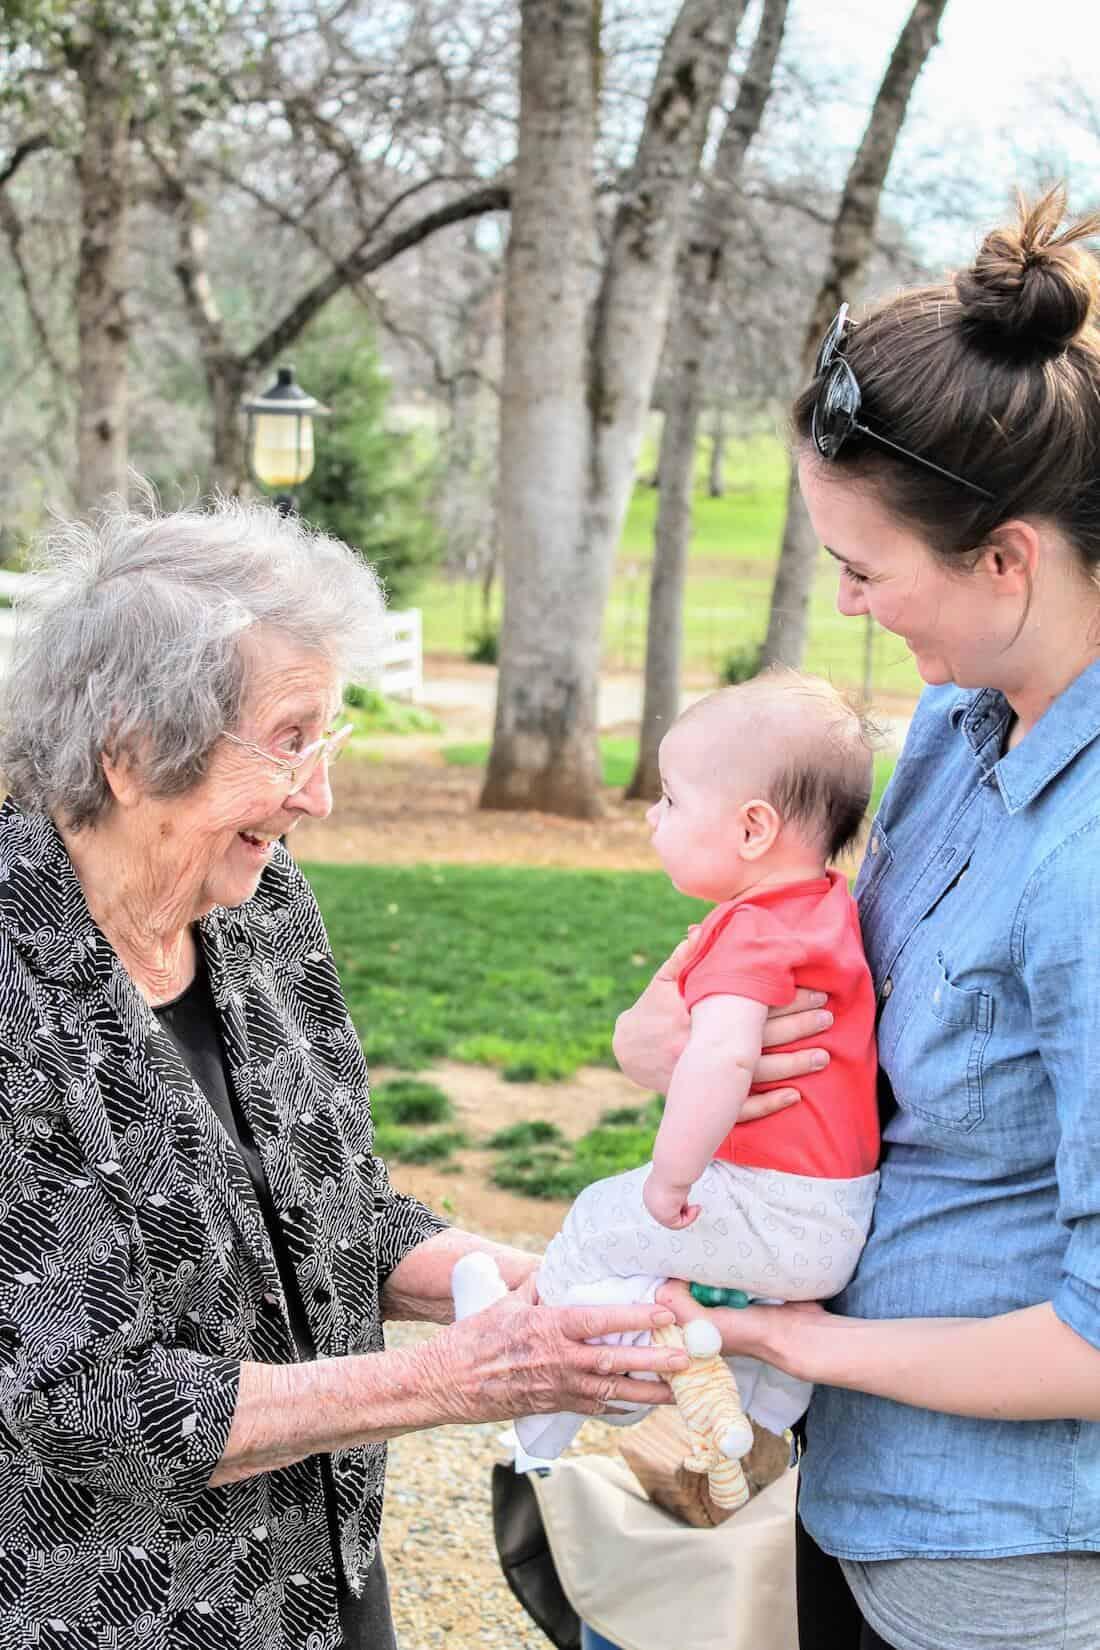 3 Life Lessons Straight from Grandma's Heart   #grandma #grandmagifts #grandparents #family #newmom #sponsored